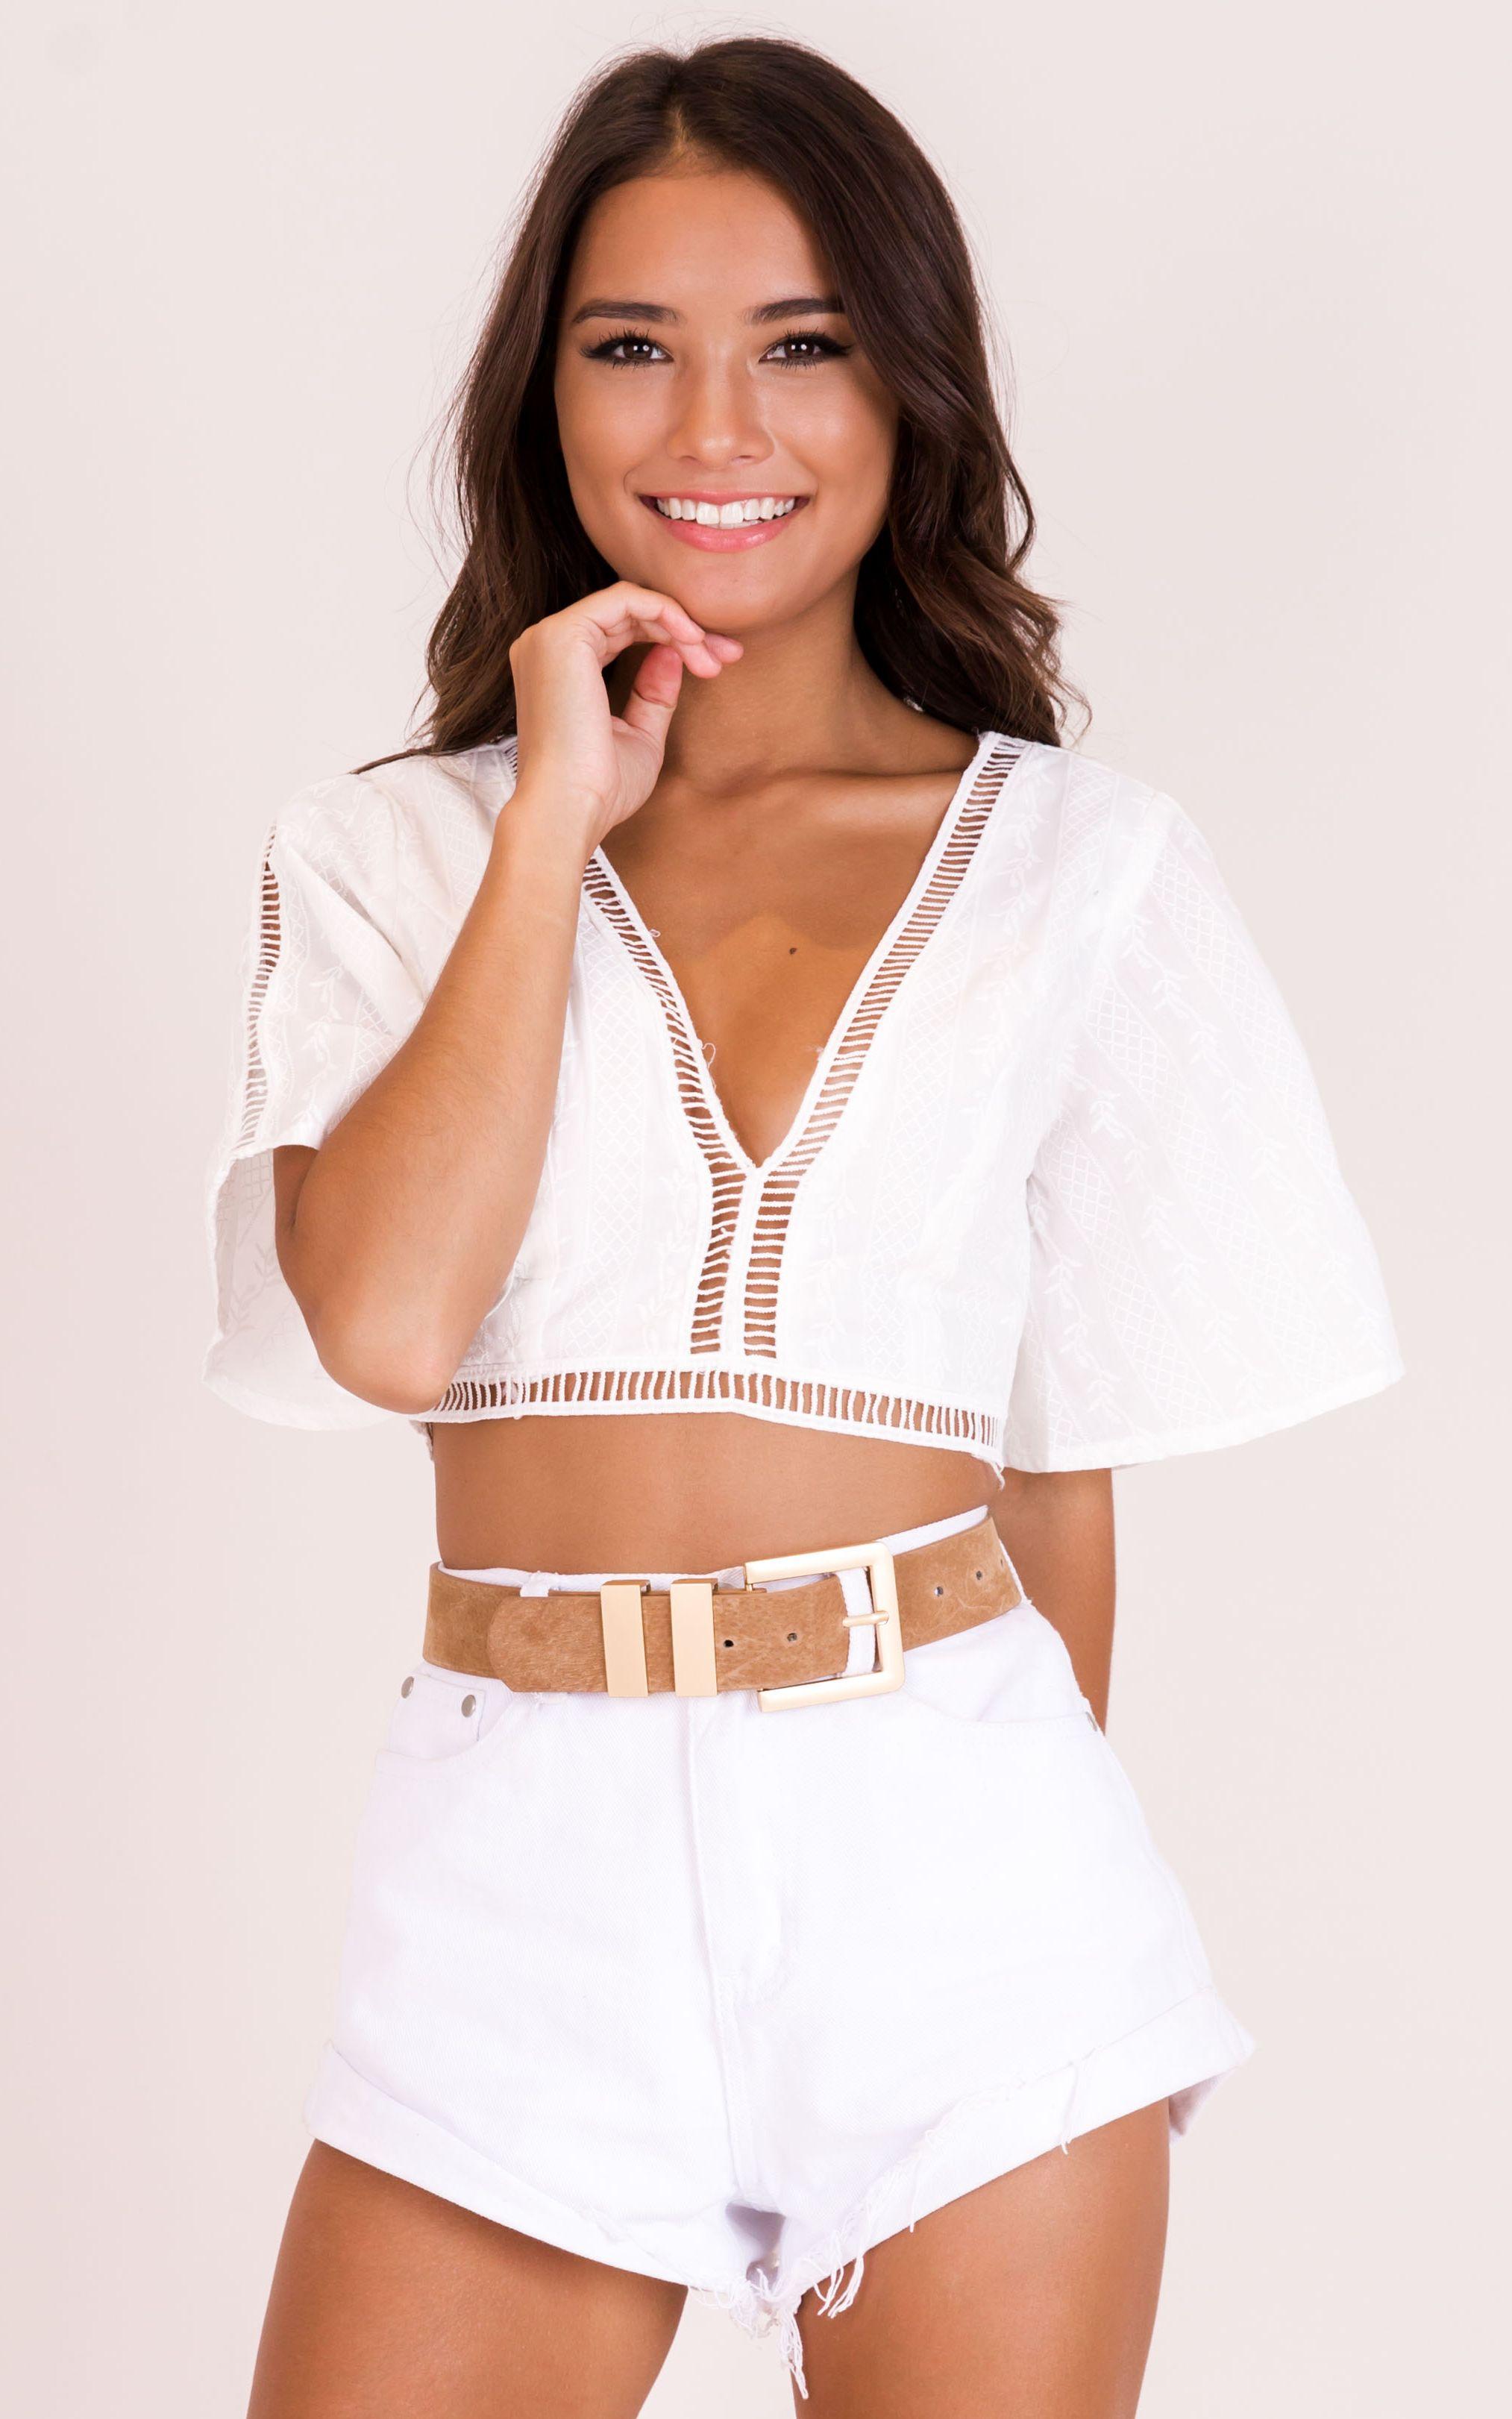 White Peasant Top, White Crop Top, White Shirt